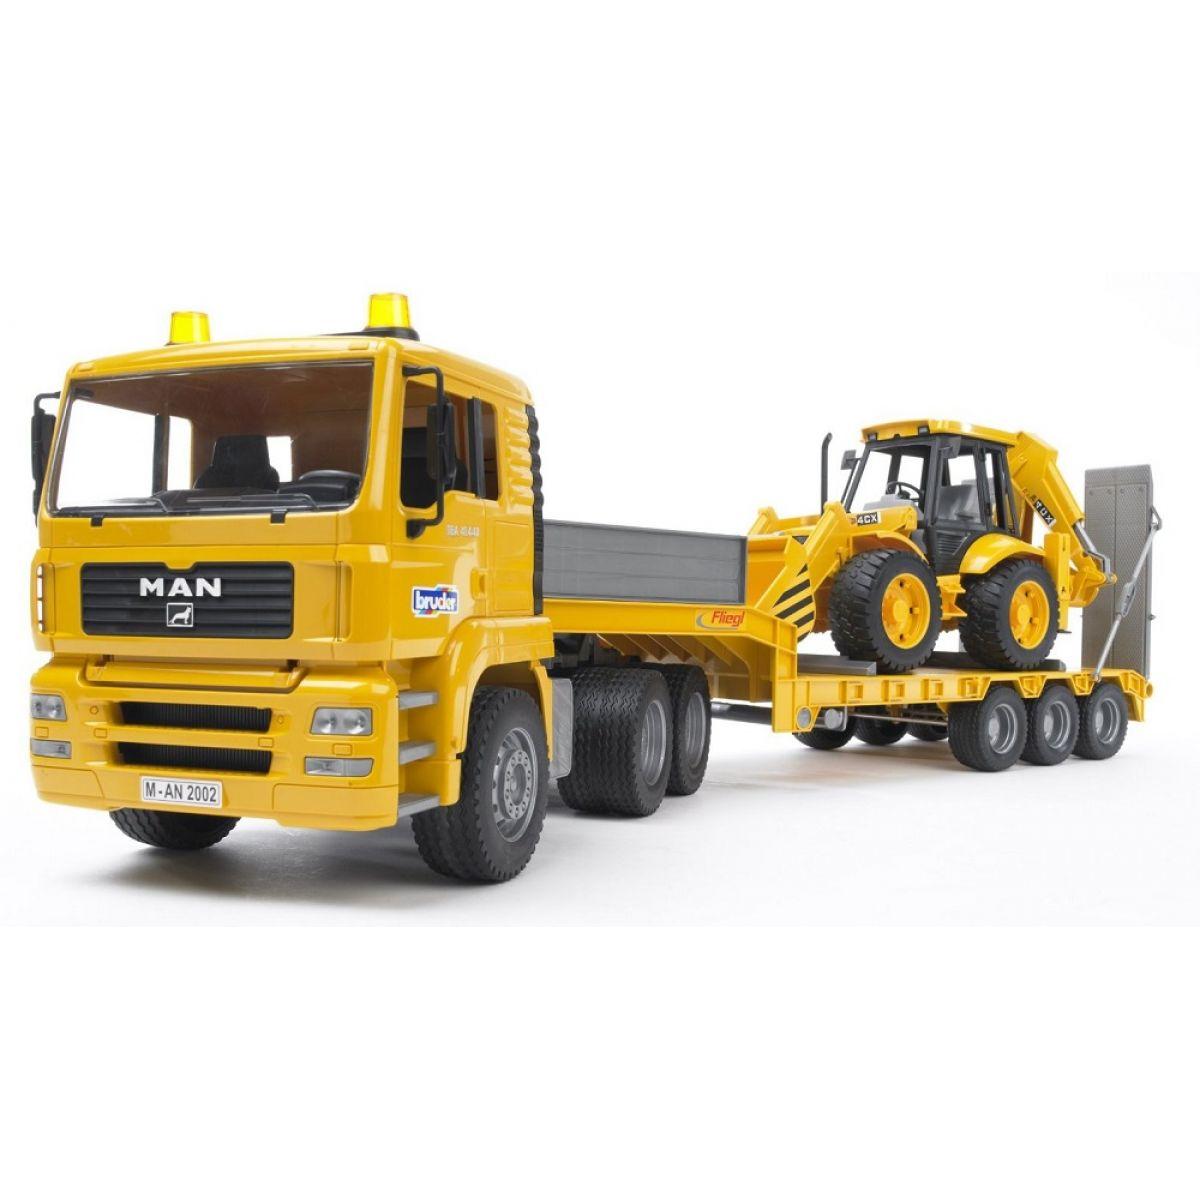 BRUDER 2776 - Nákladní auto MAN - Návěs + Traktor JCB Bruder